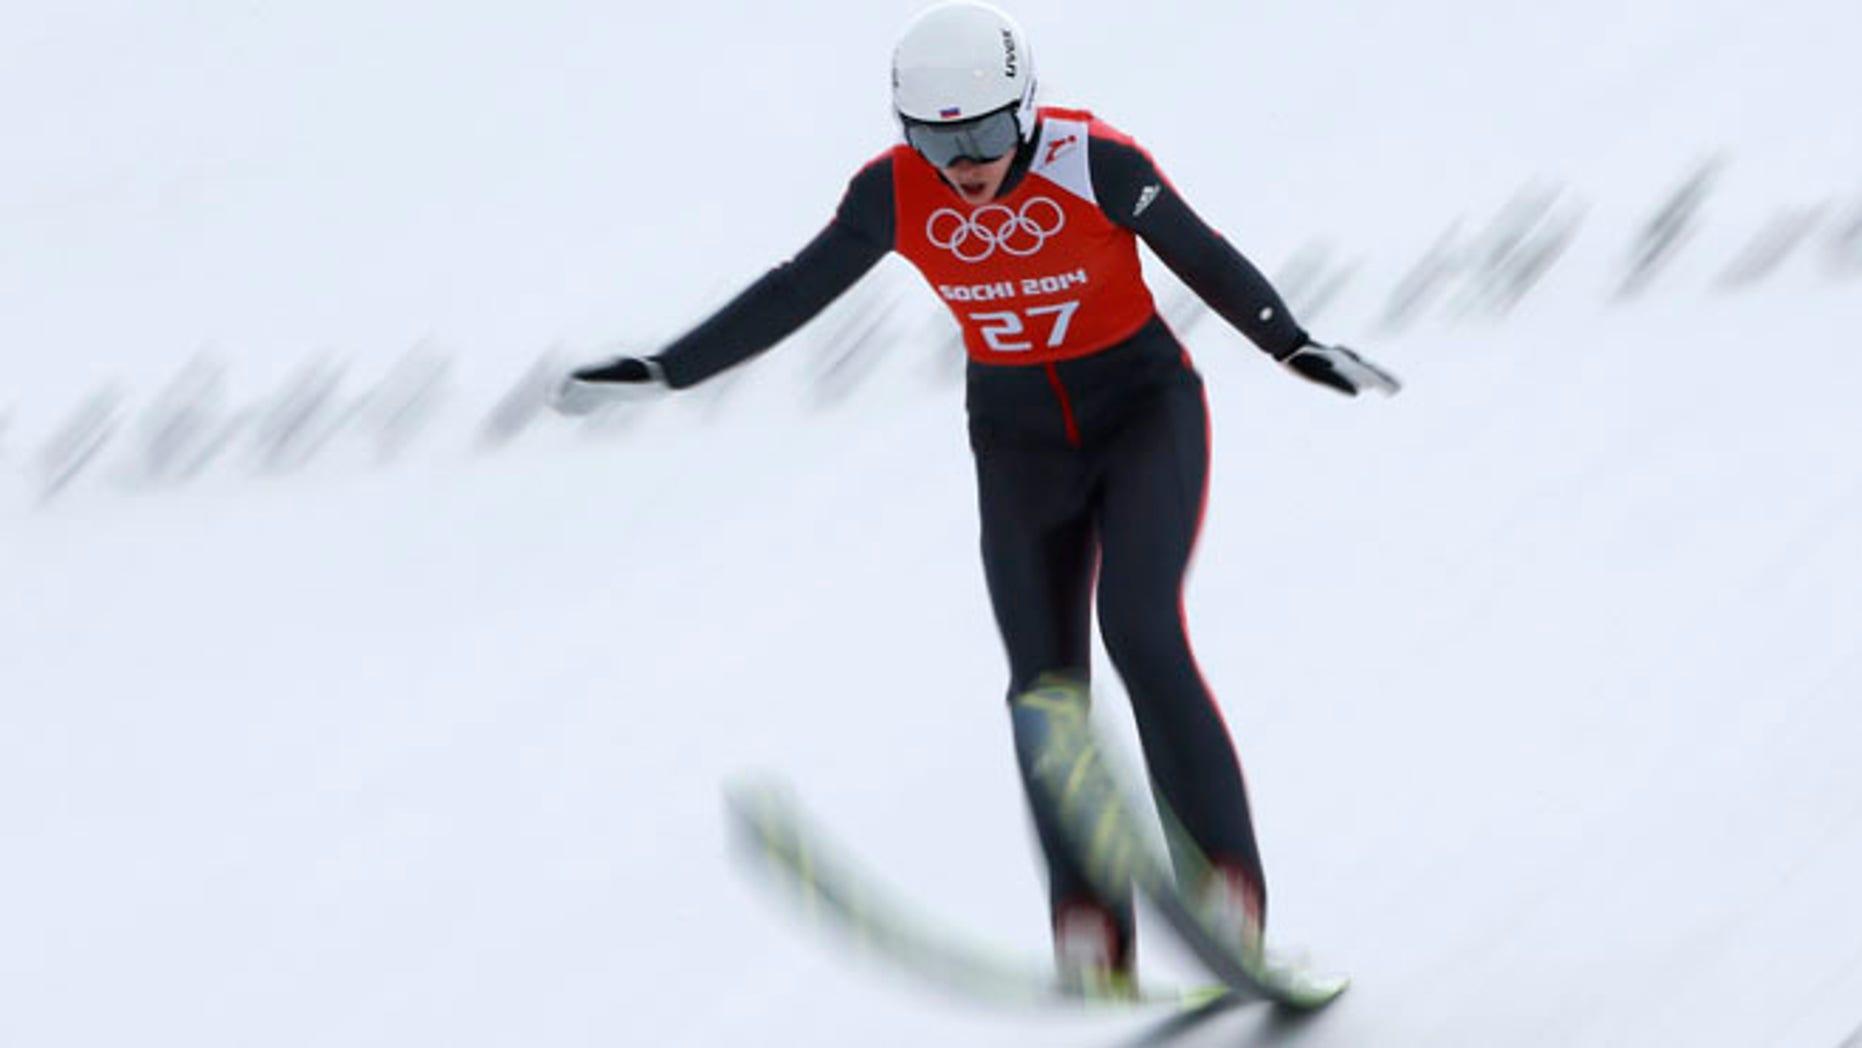 Feb. 9, 2014: Russia's Irina Avvakumova lands during a women's normal hill individual training session at the 2014 Winter Olympics in Krasnaya Polyana, Russia.